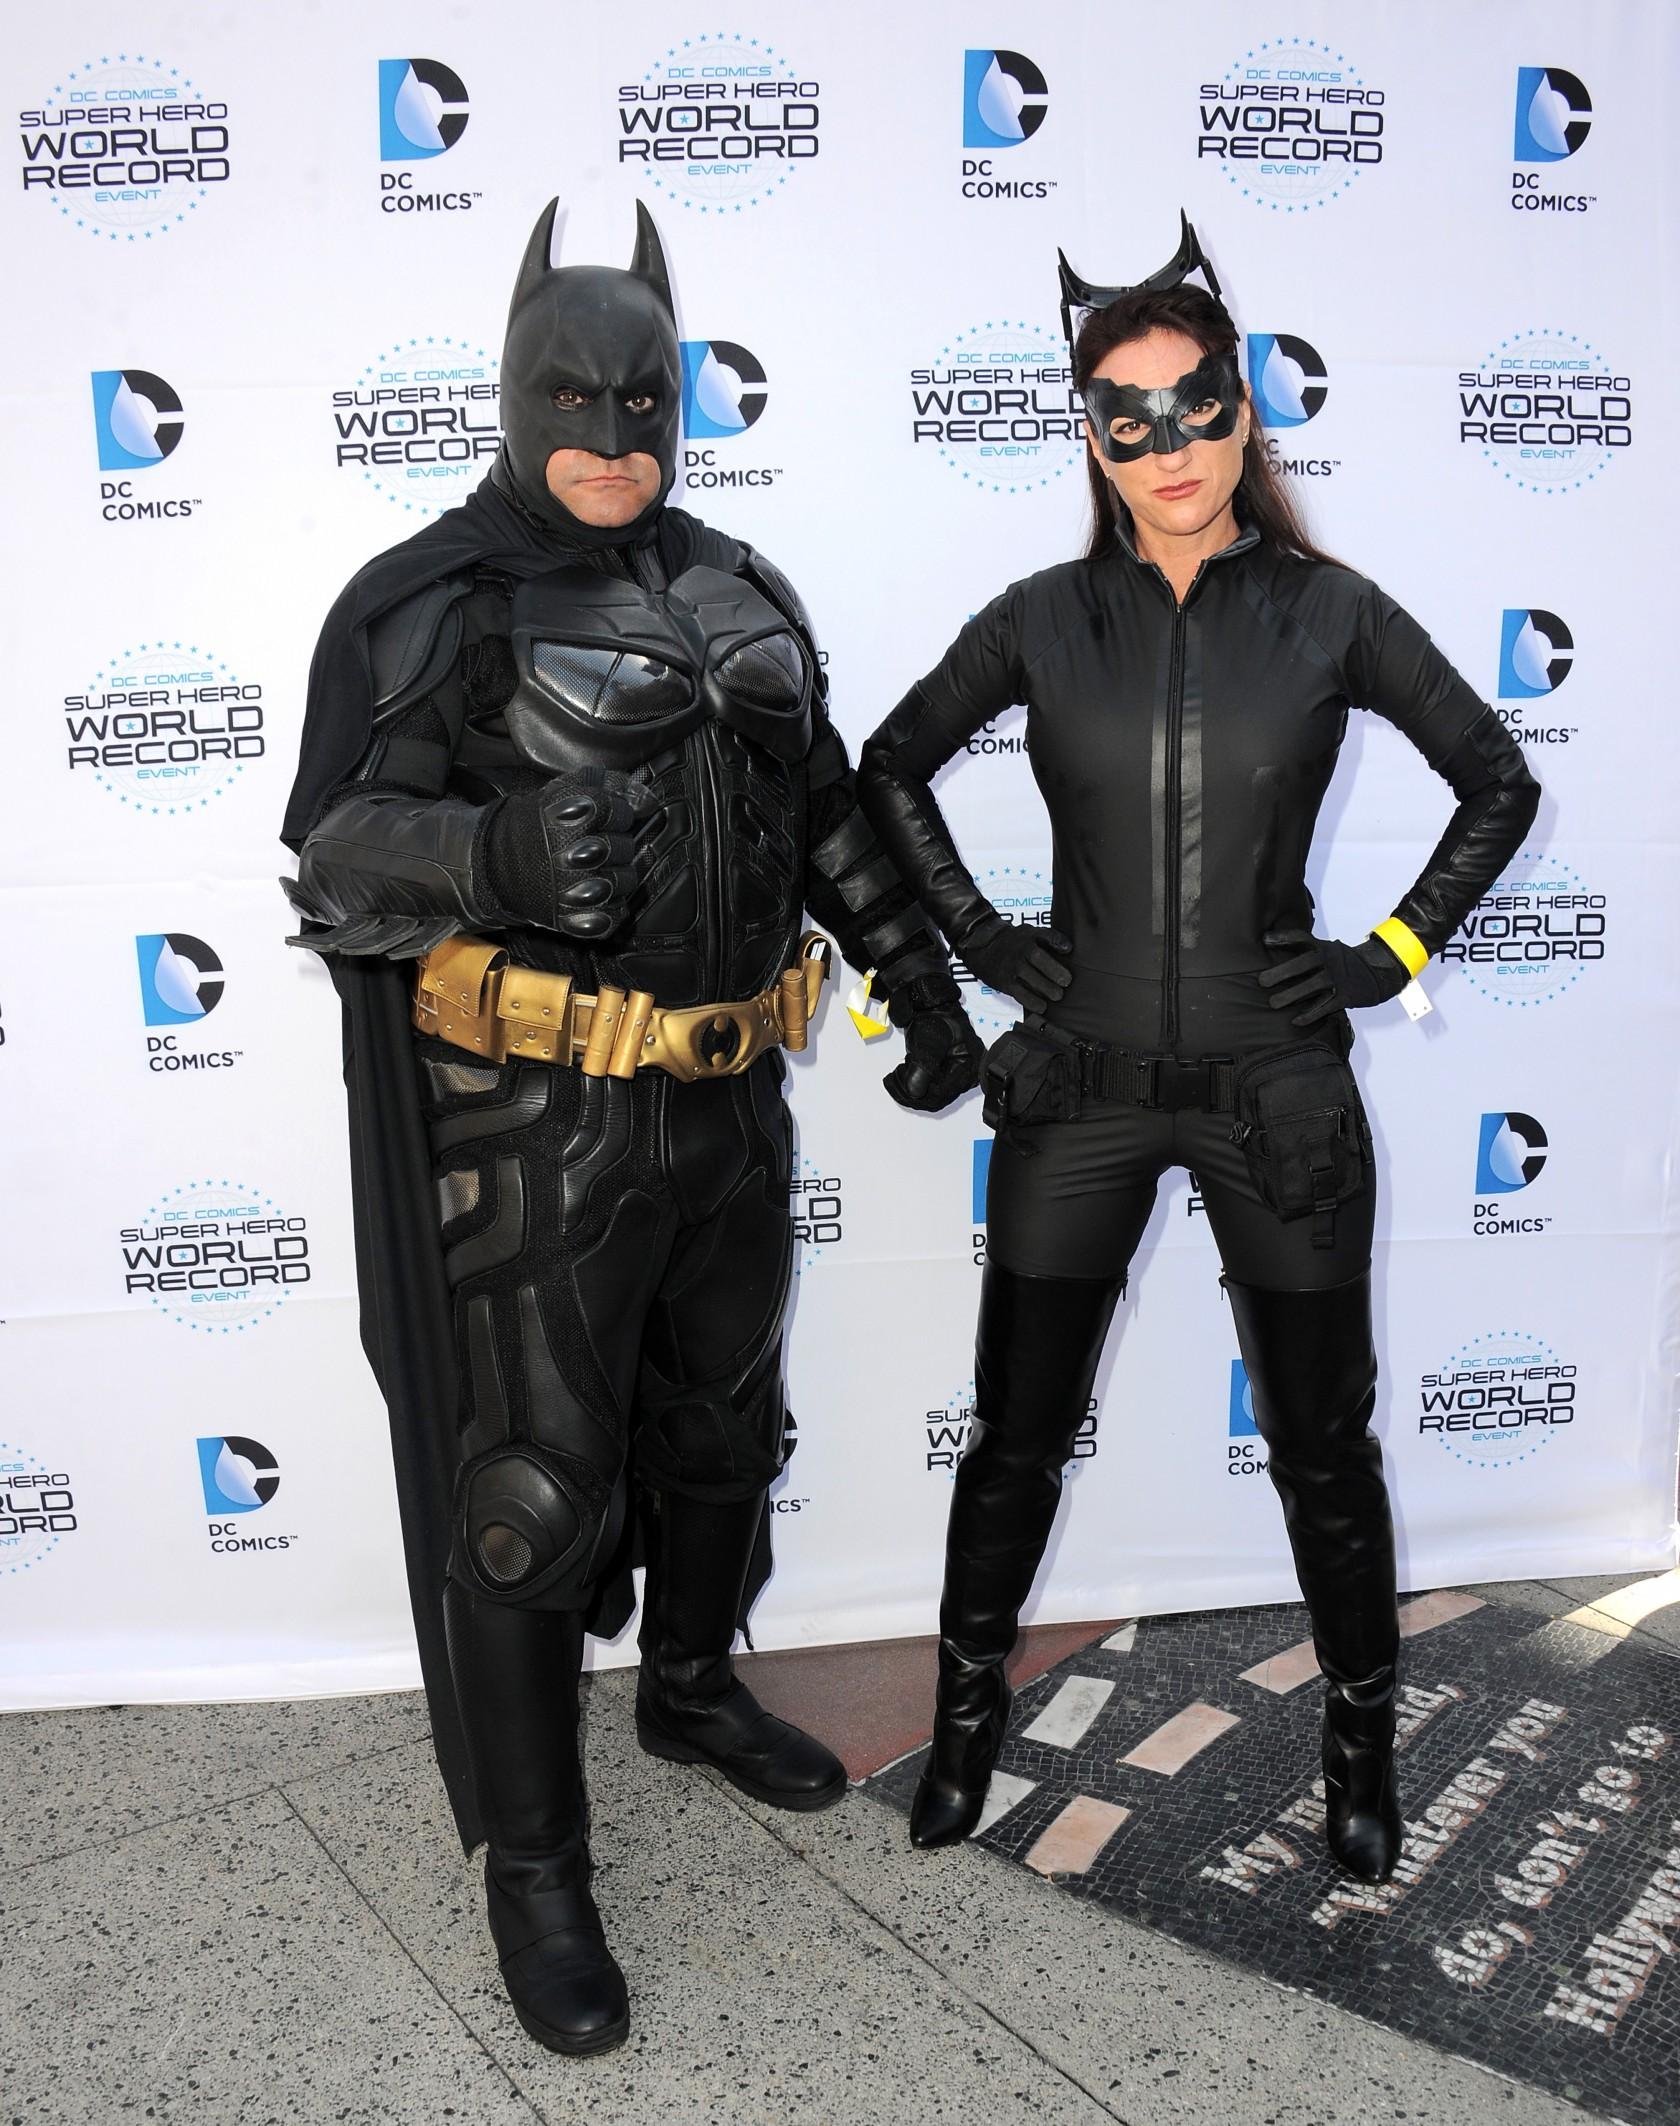 Warner Bros. And DC Comics Super Hero World Record Event